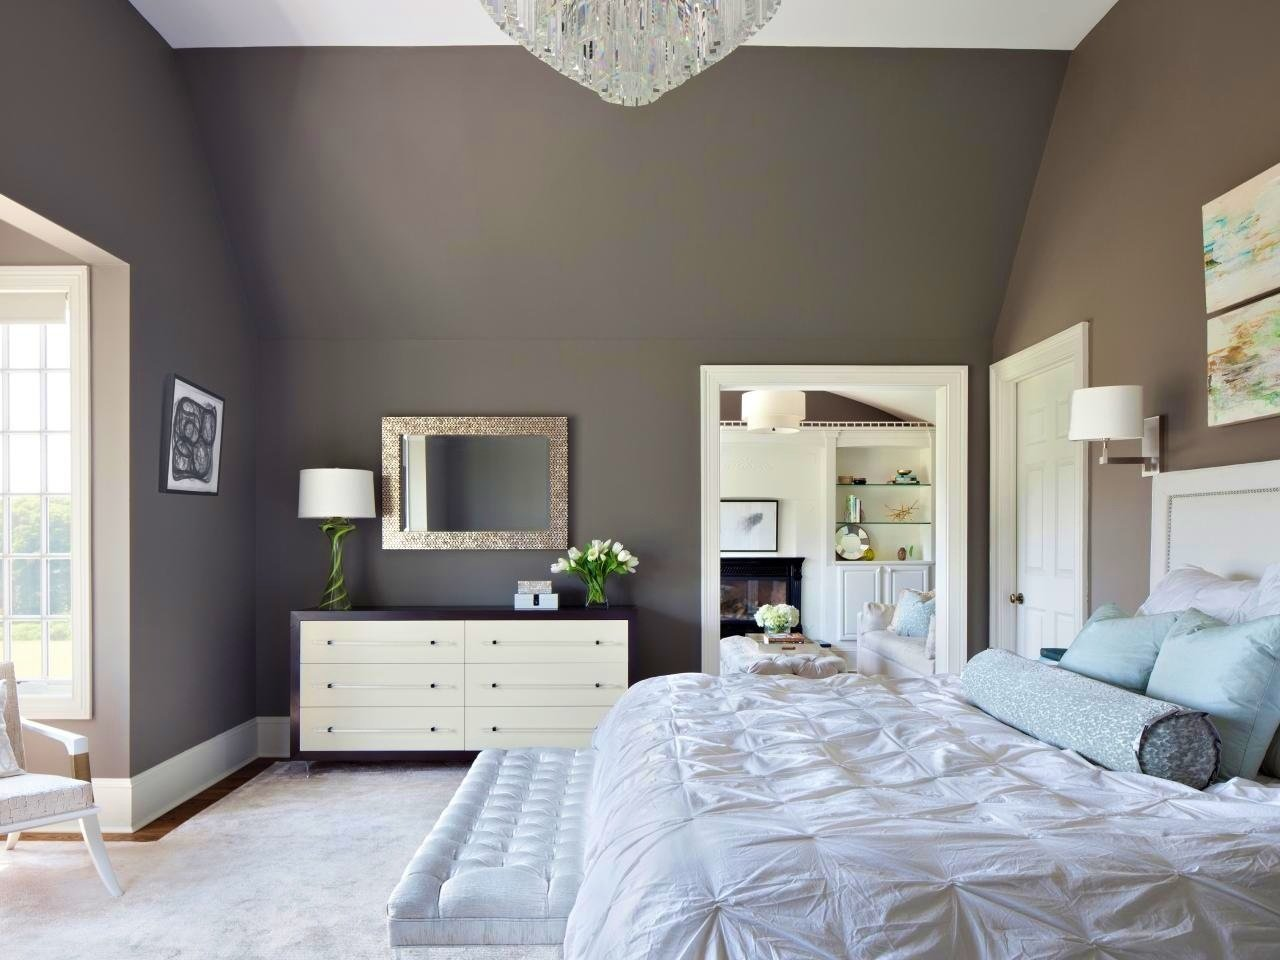 pokraska sten v interere 60 - Идеи для ремонта спальни своими руками